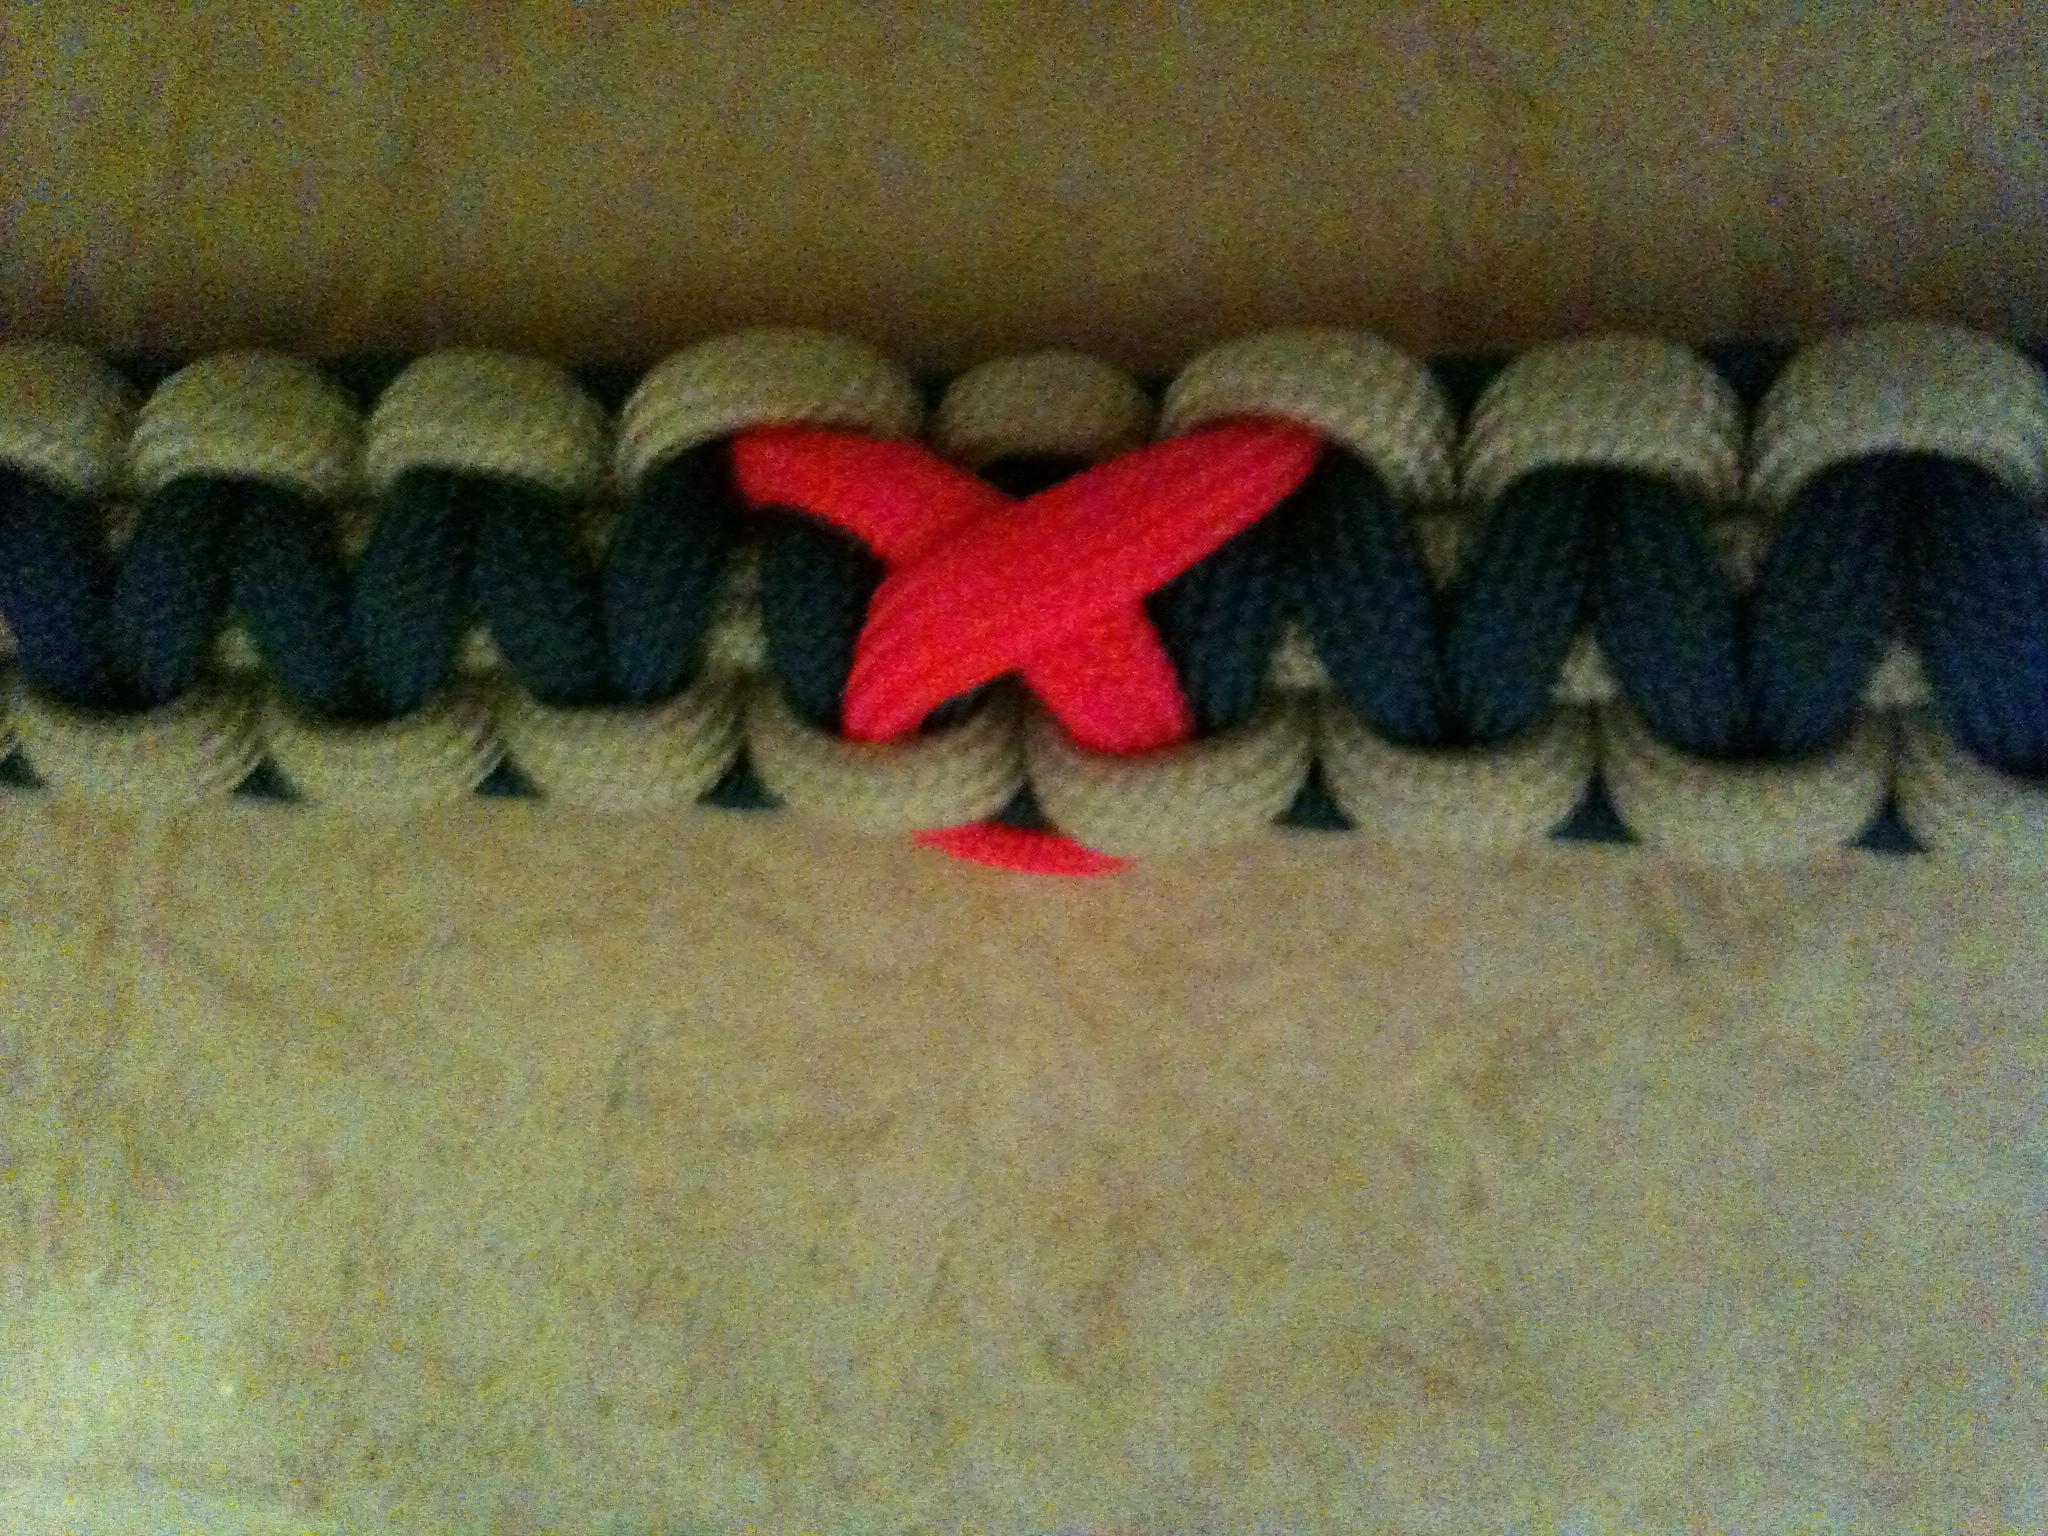 Awareness symbol on paracord bracelet